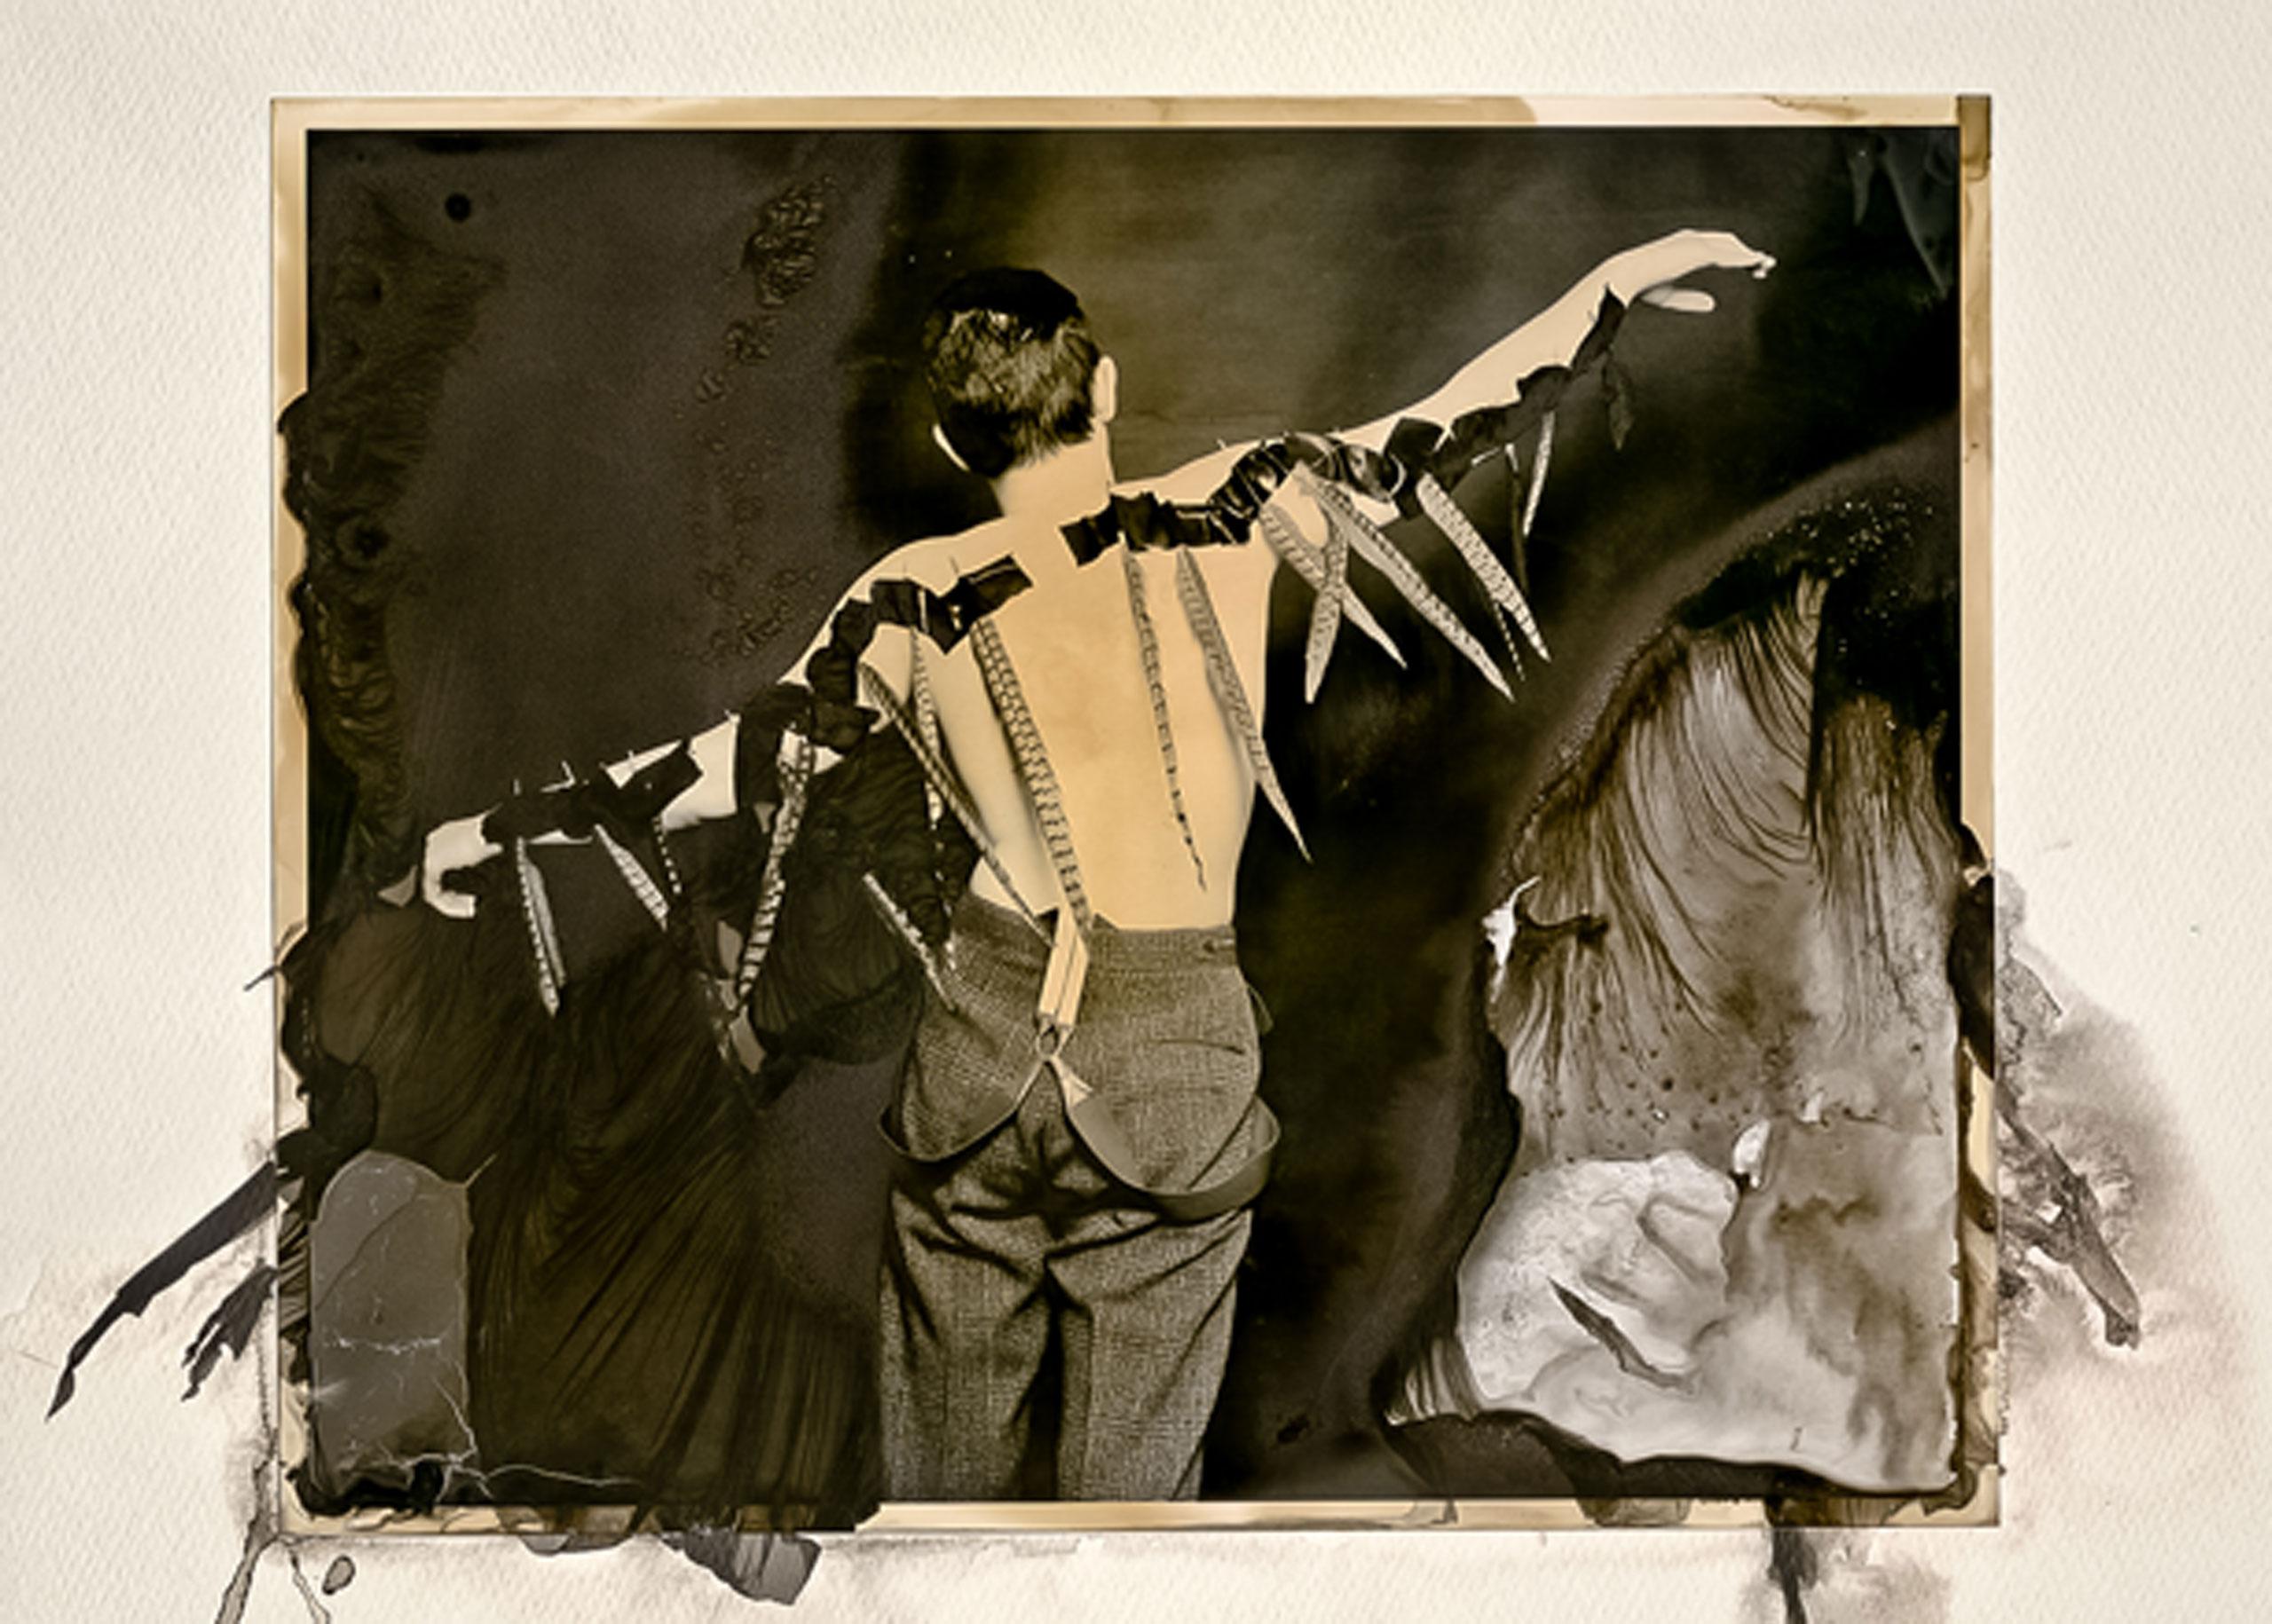 Image of Untitled, (Wings) by Csilla Kozma